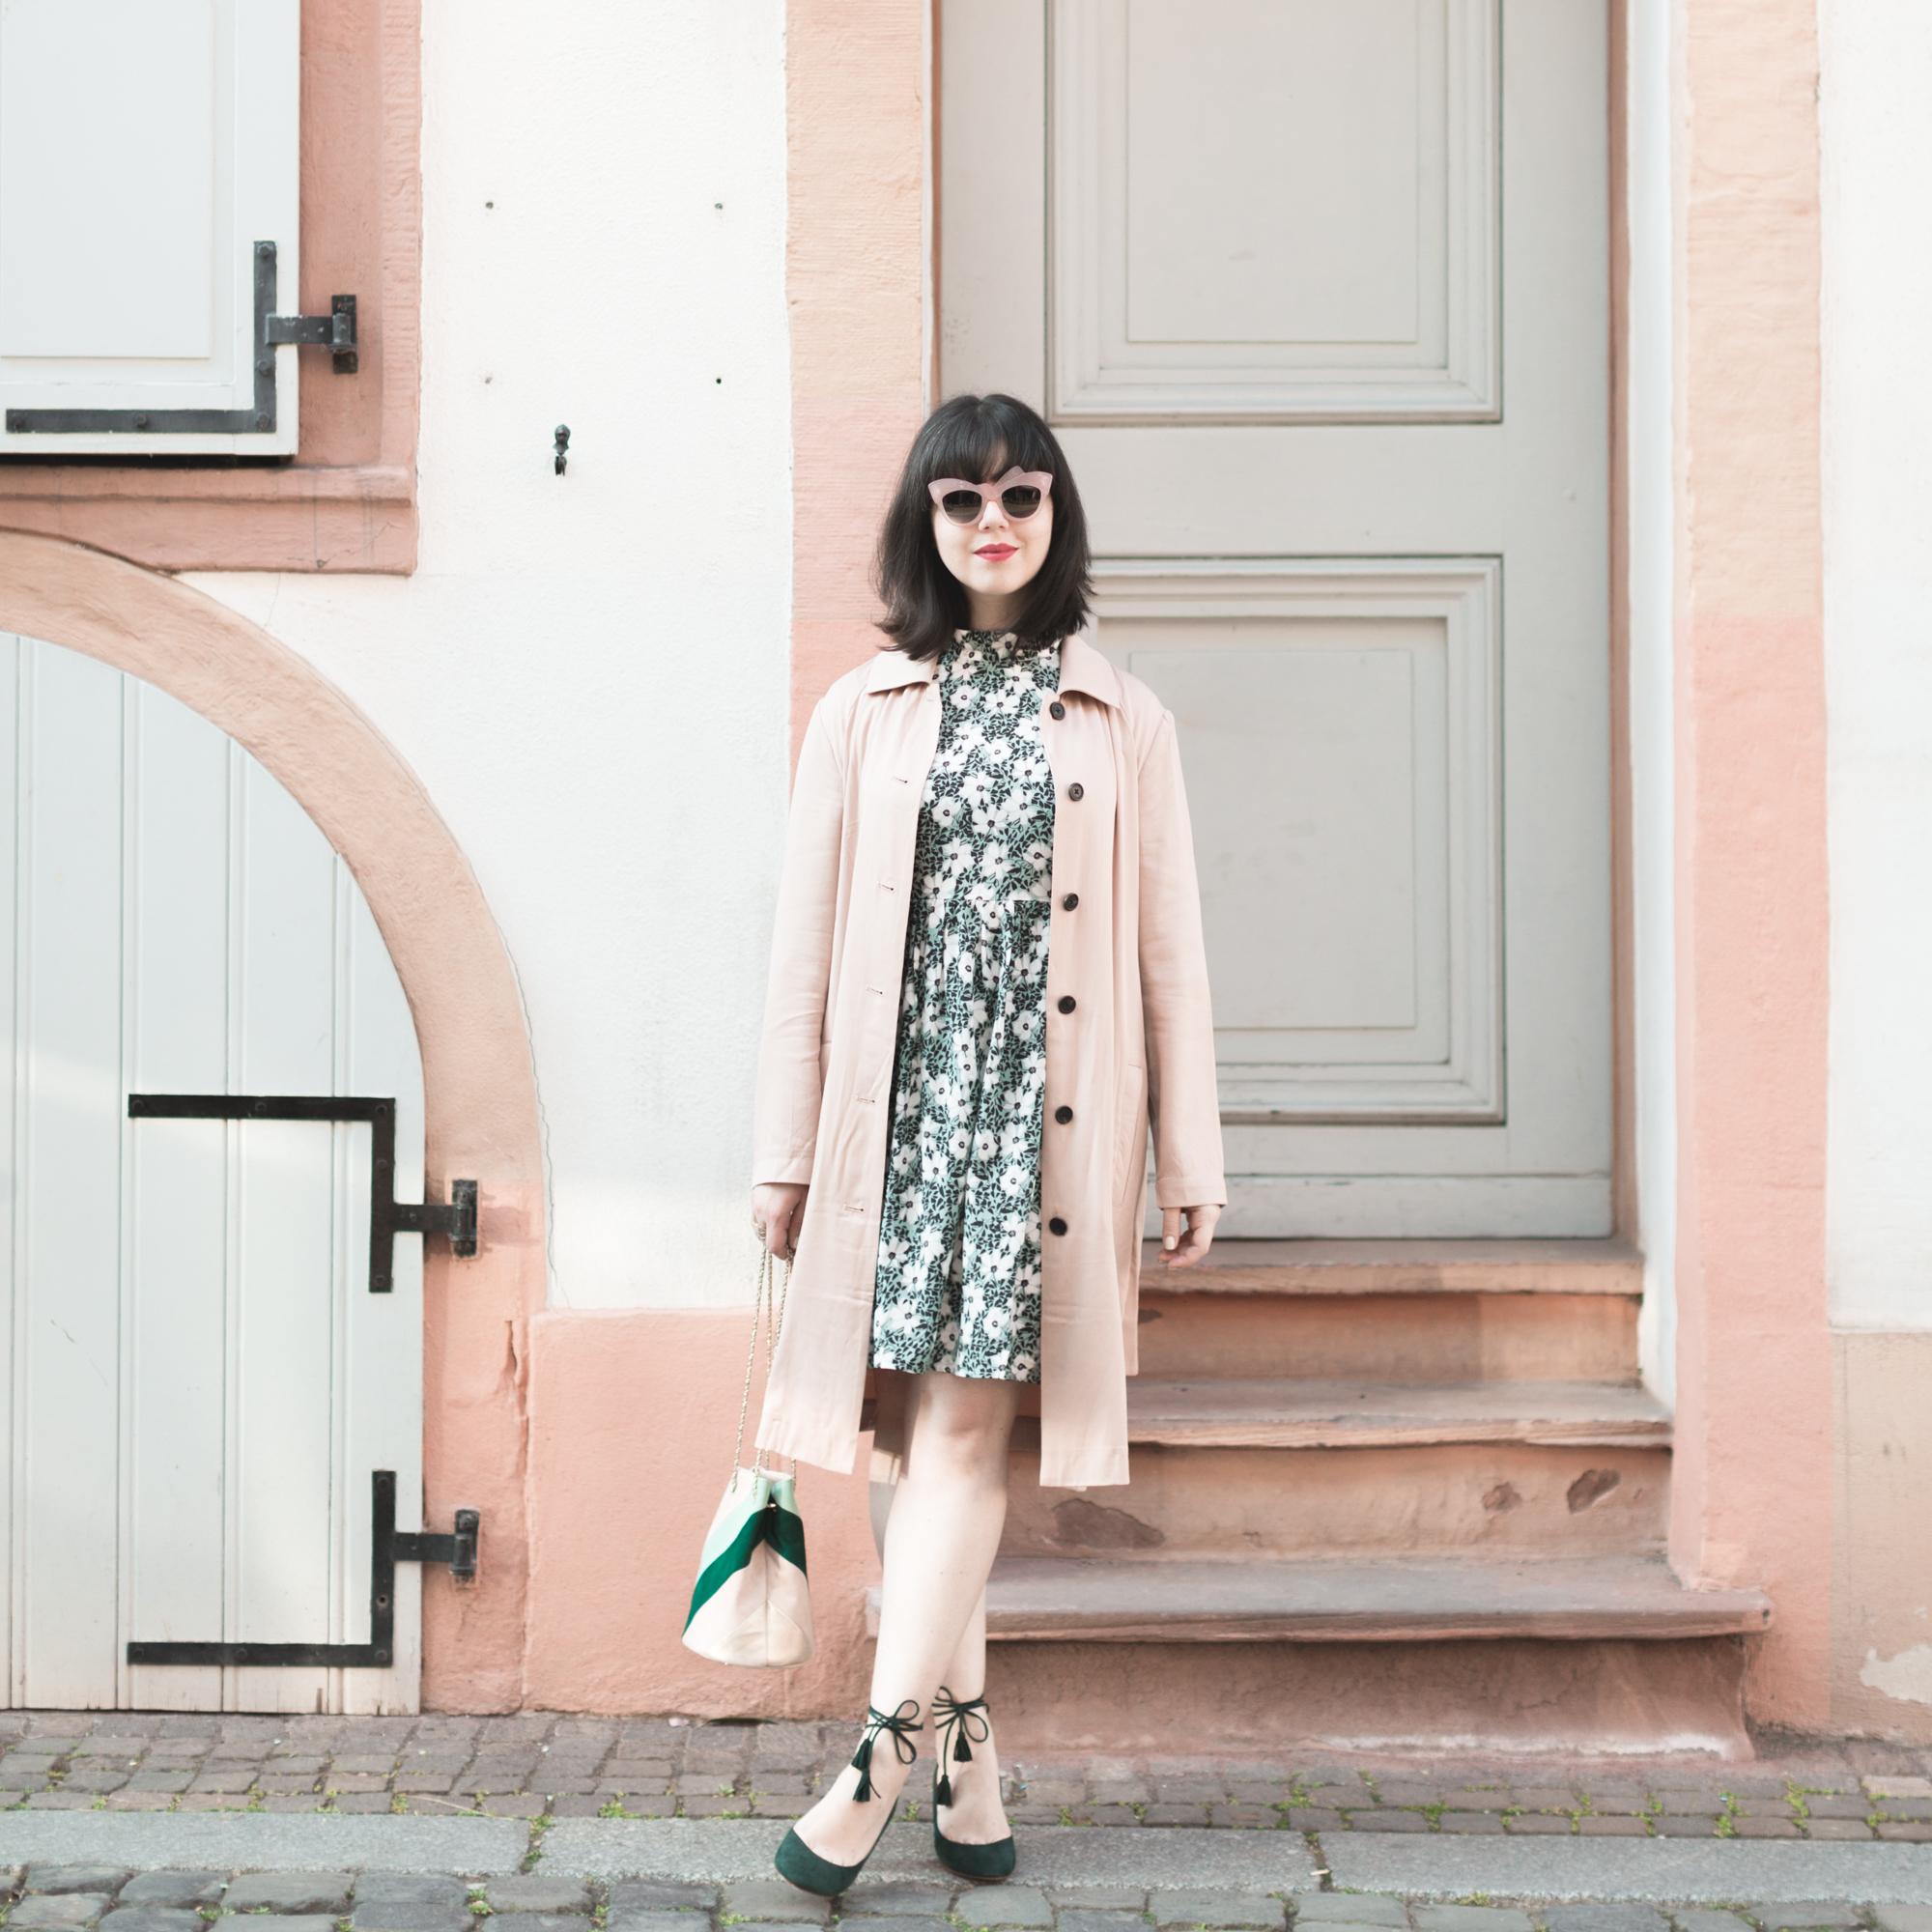 insta_kelly_love_poppy_dress_bourse_hope_sezane_patchwork_copyright_Pauline_Privez_paulinefashionblog_com-1-2